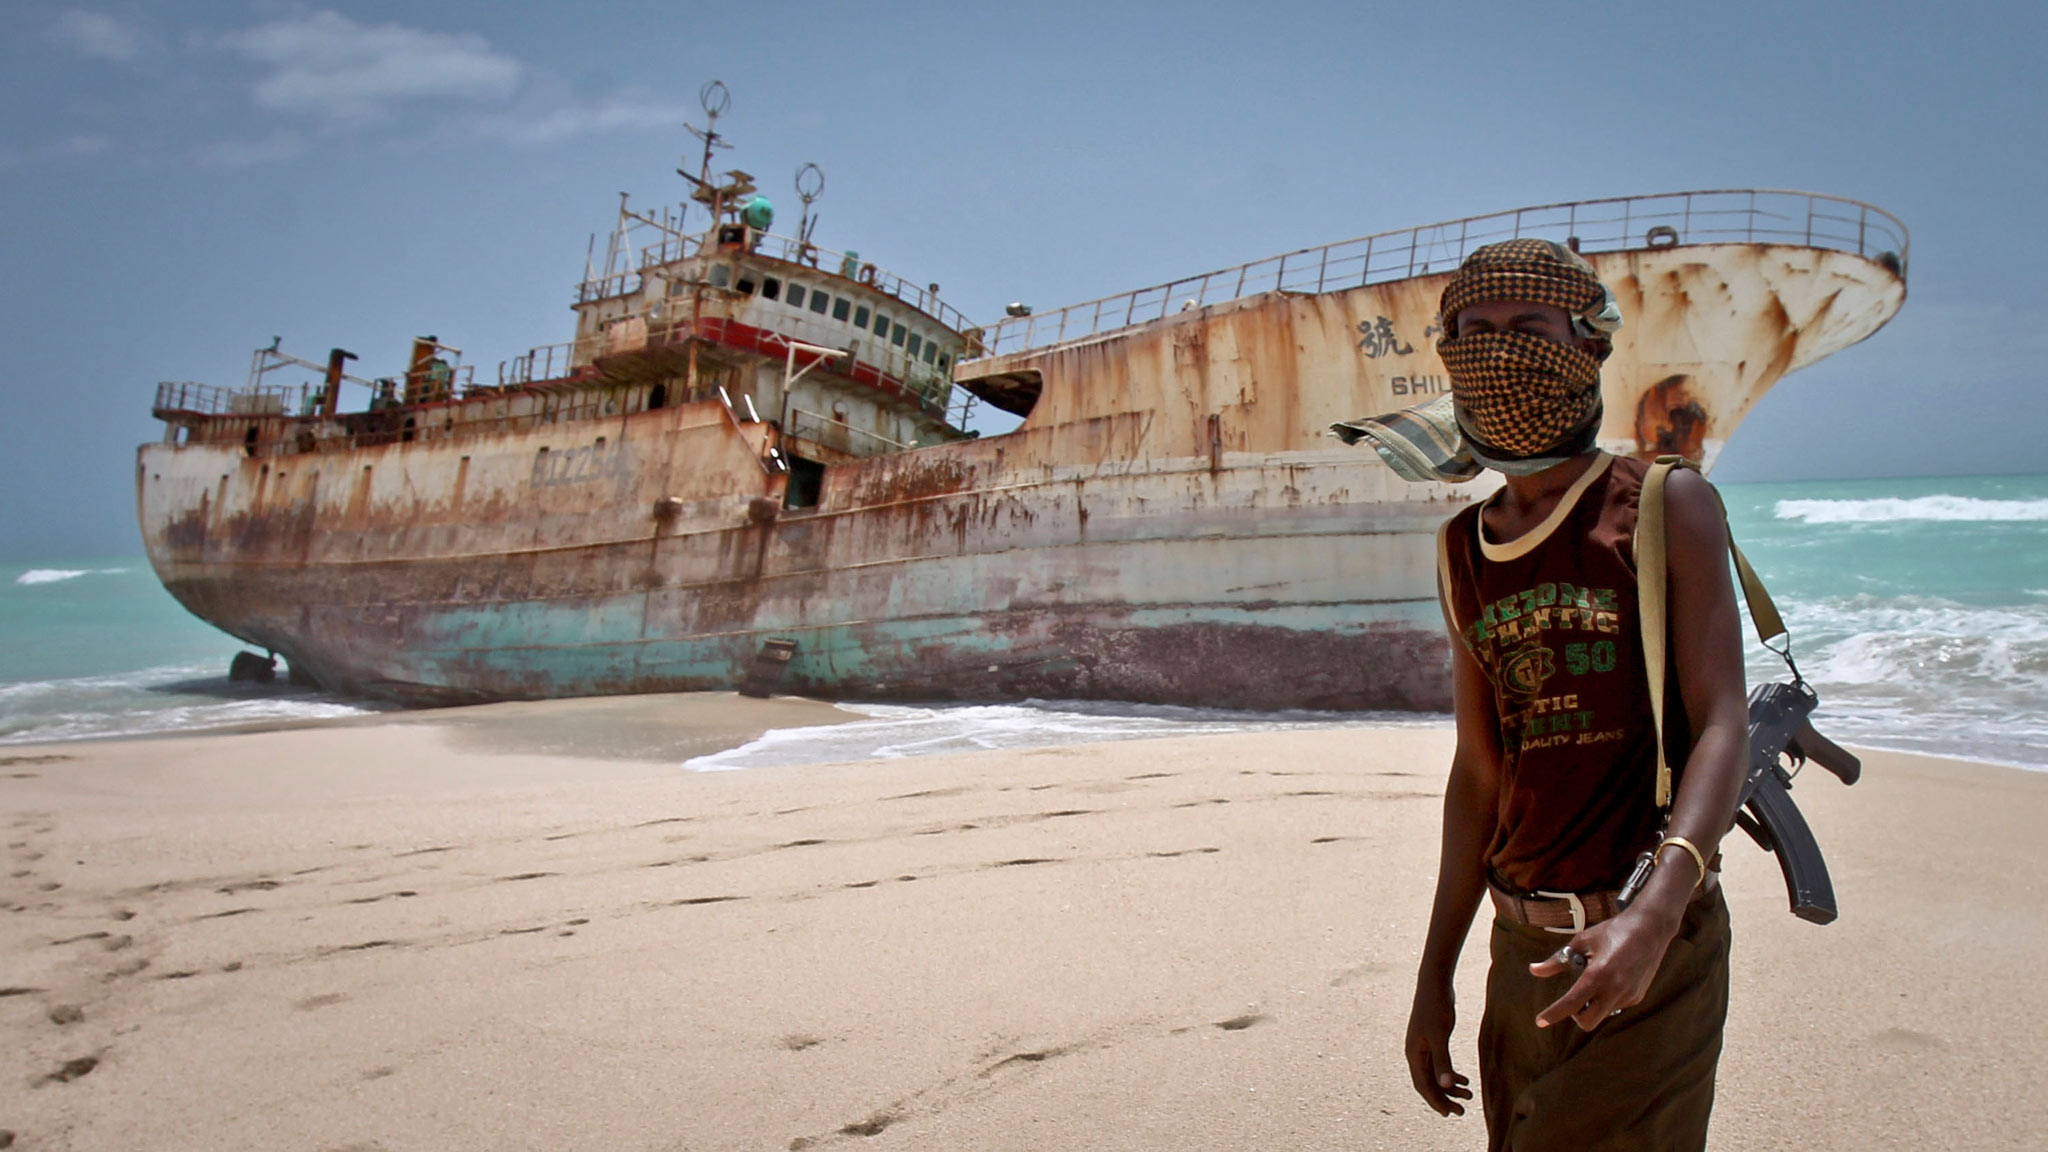 Somalia oil thrown on the fire for K9 fishing line